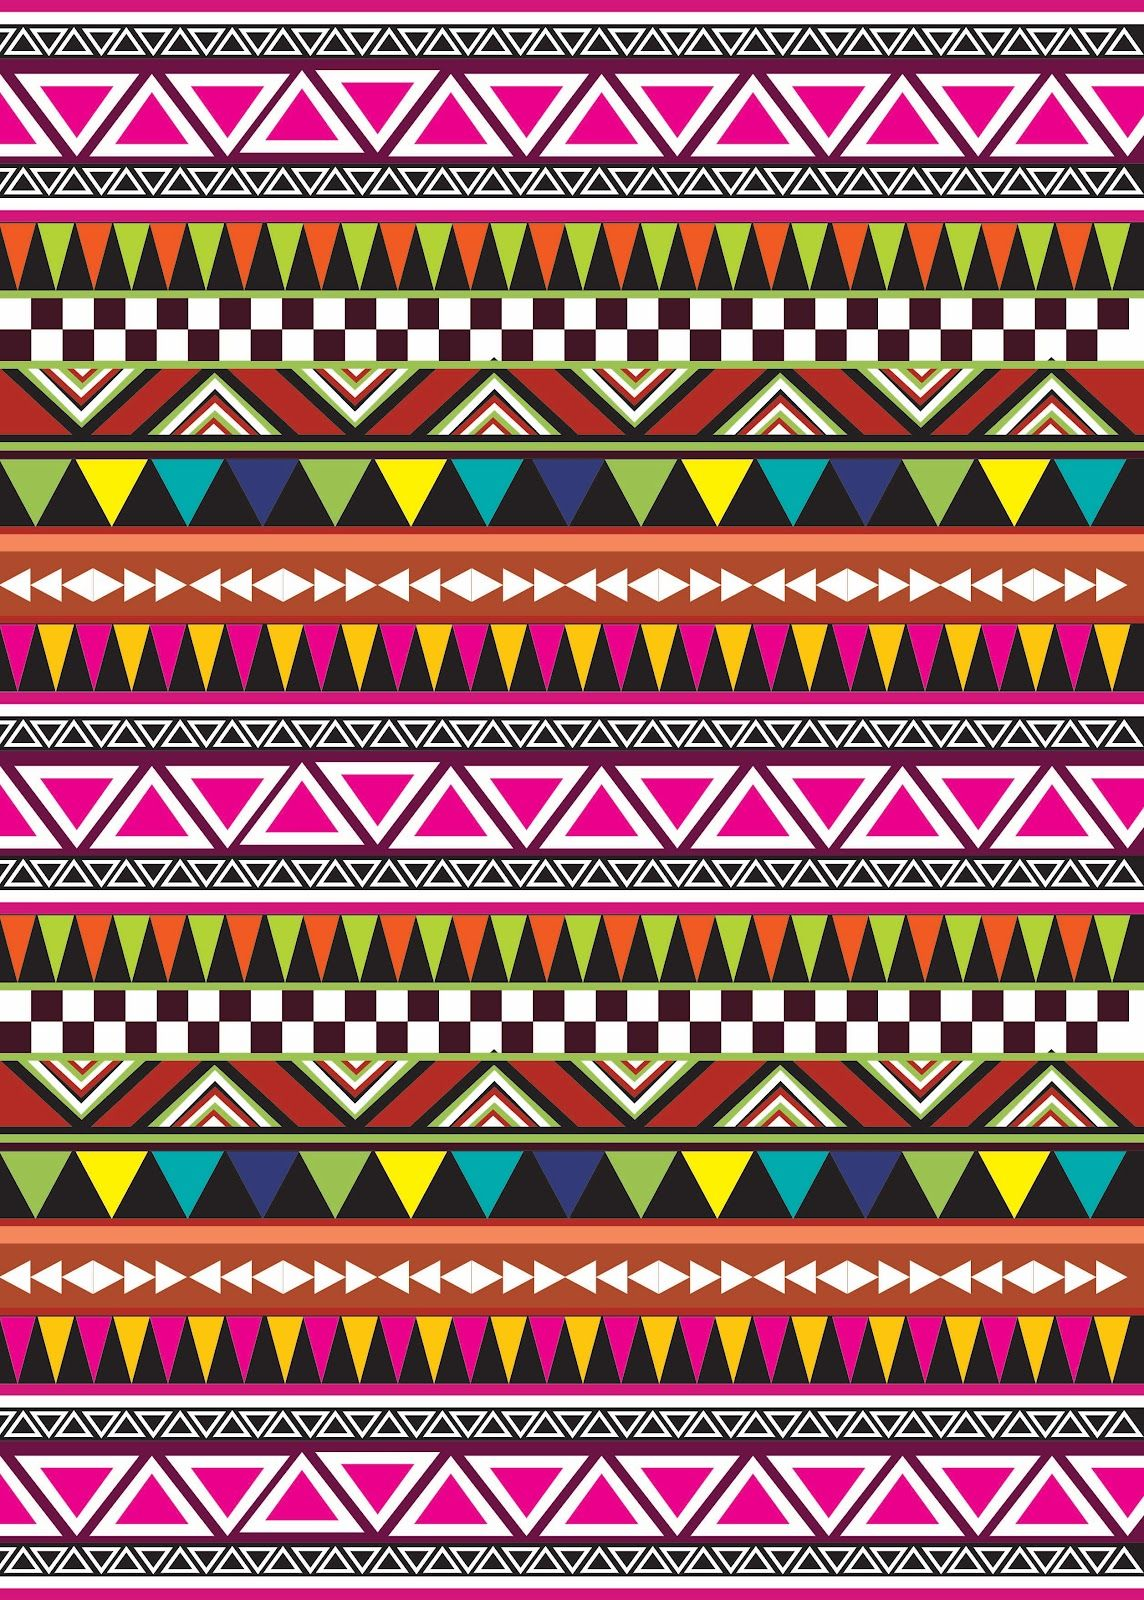 African Tribal Art Google Search Tribal Pattern Wallpaper Tribal Print Wallpaper Aztec Wallpaper